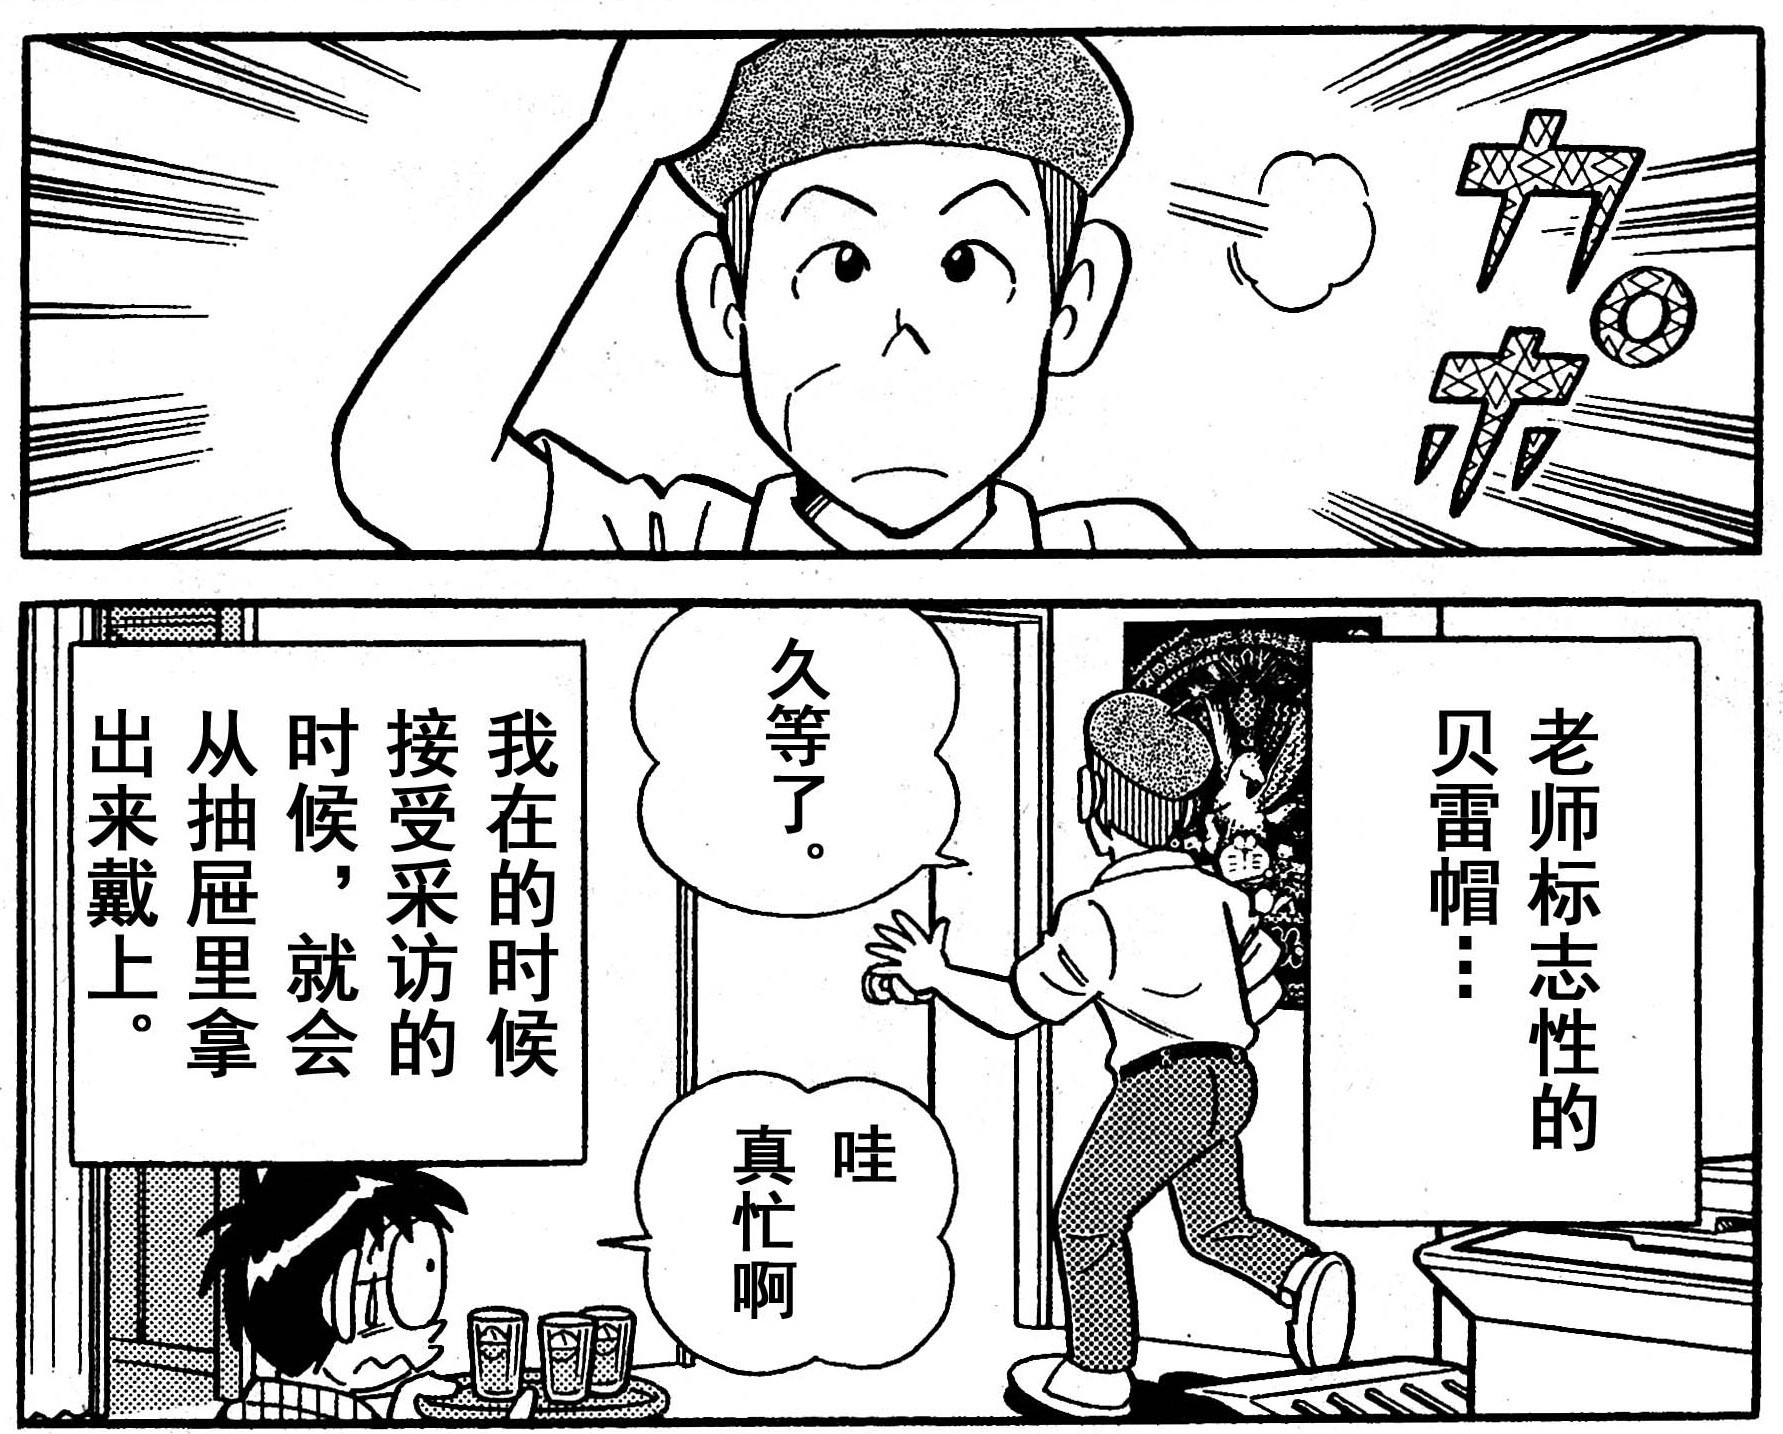 哆啦A梦冷知识 摸鱼头条 moyunews.com